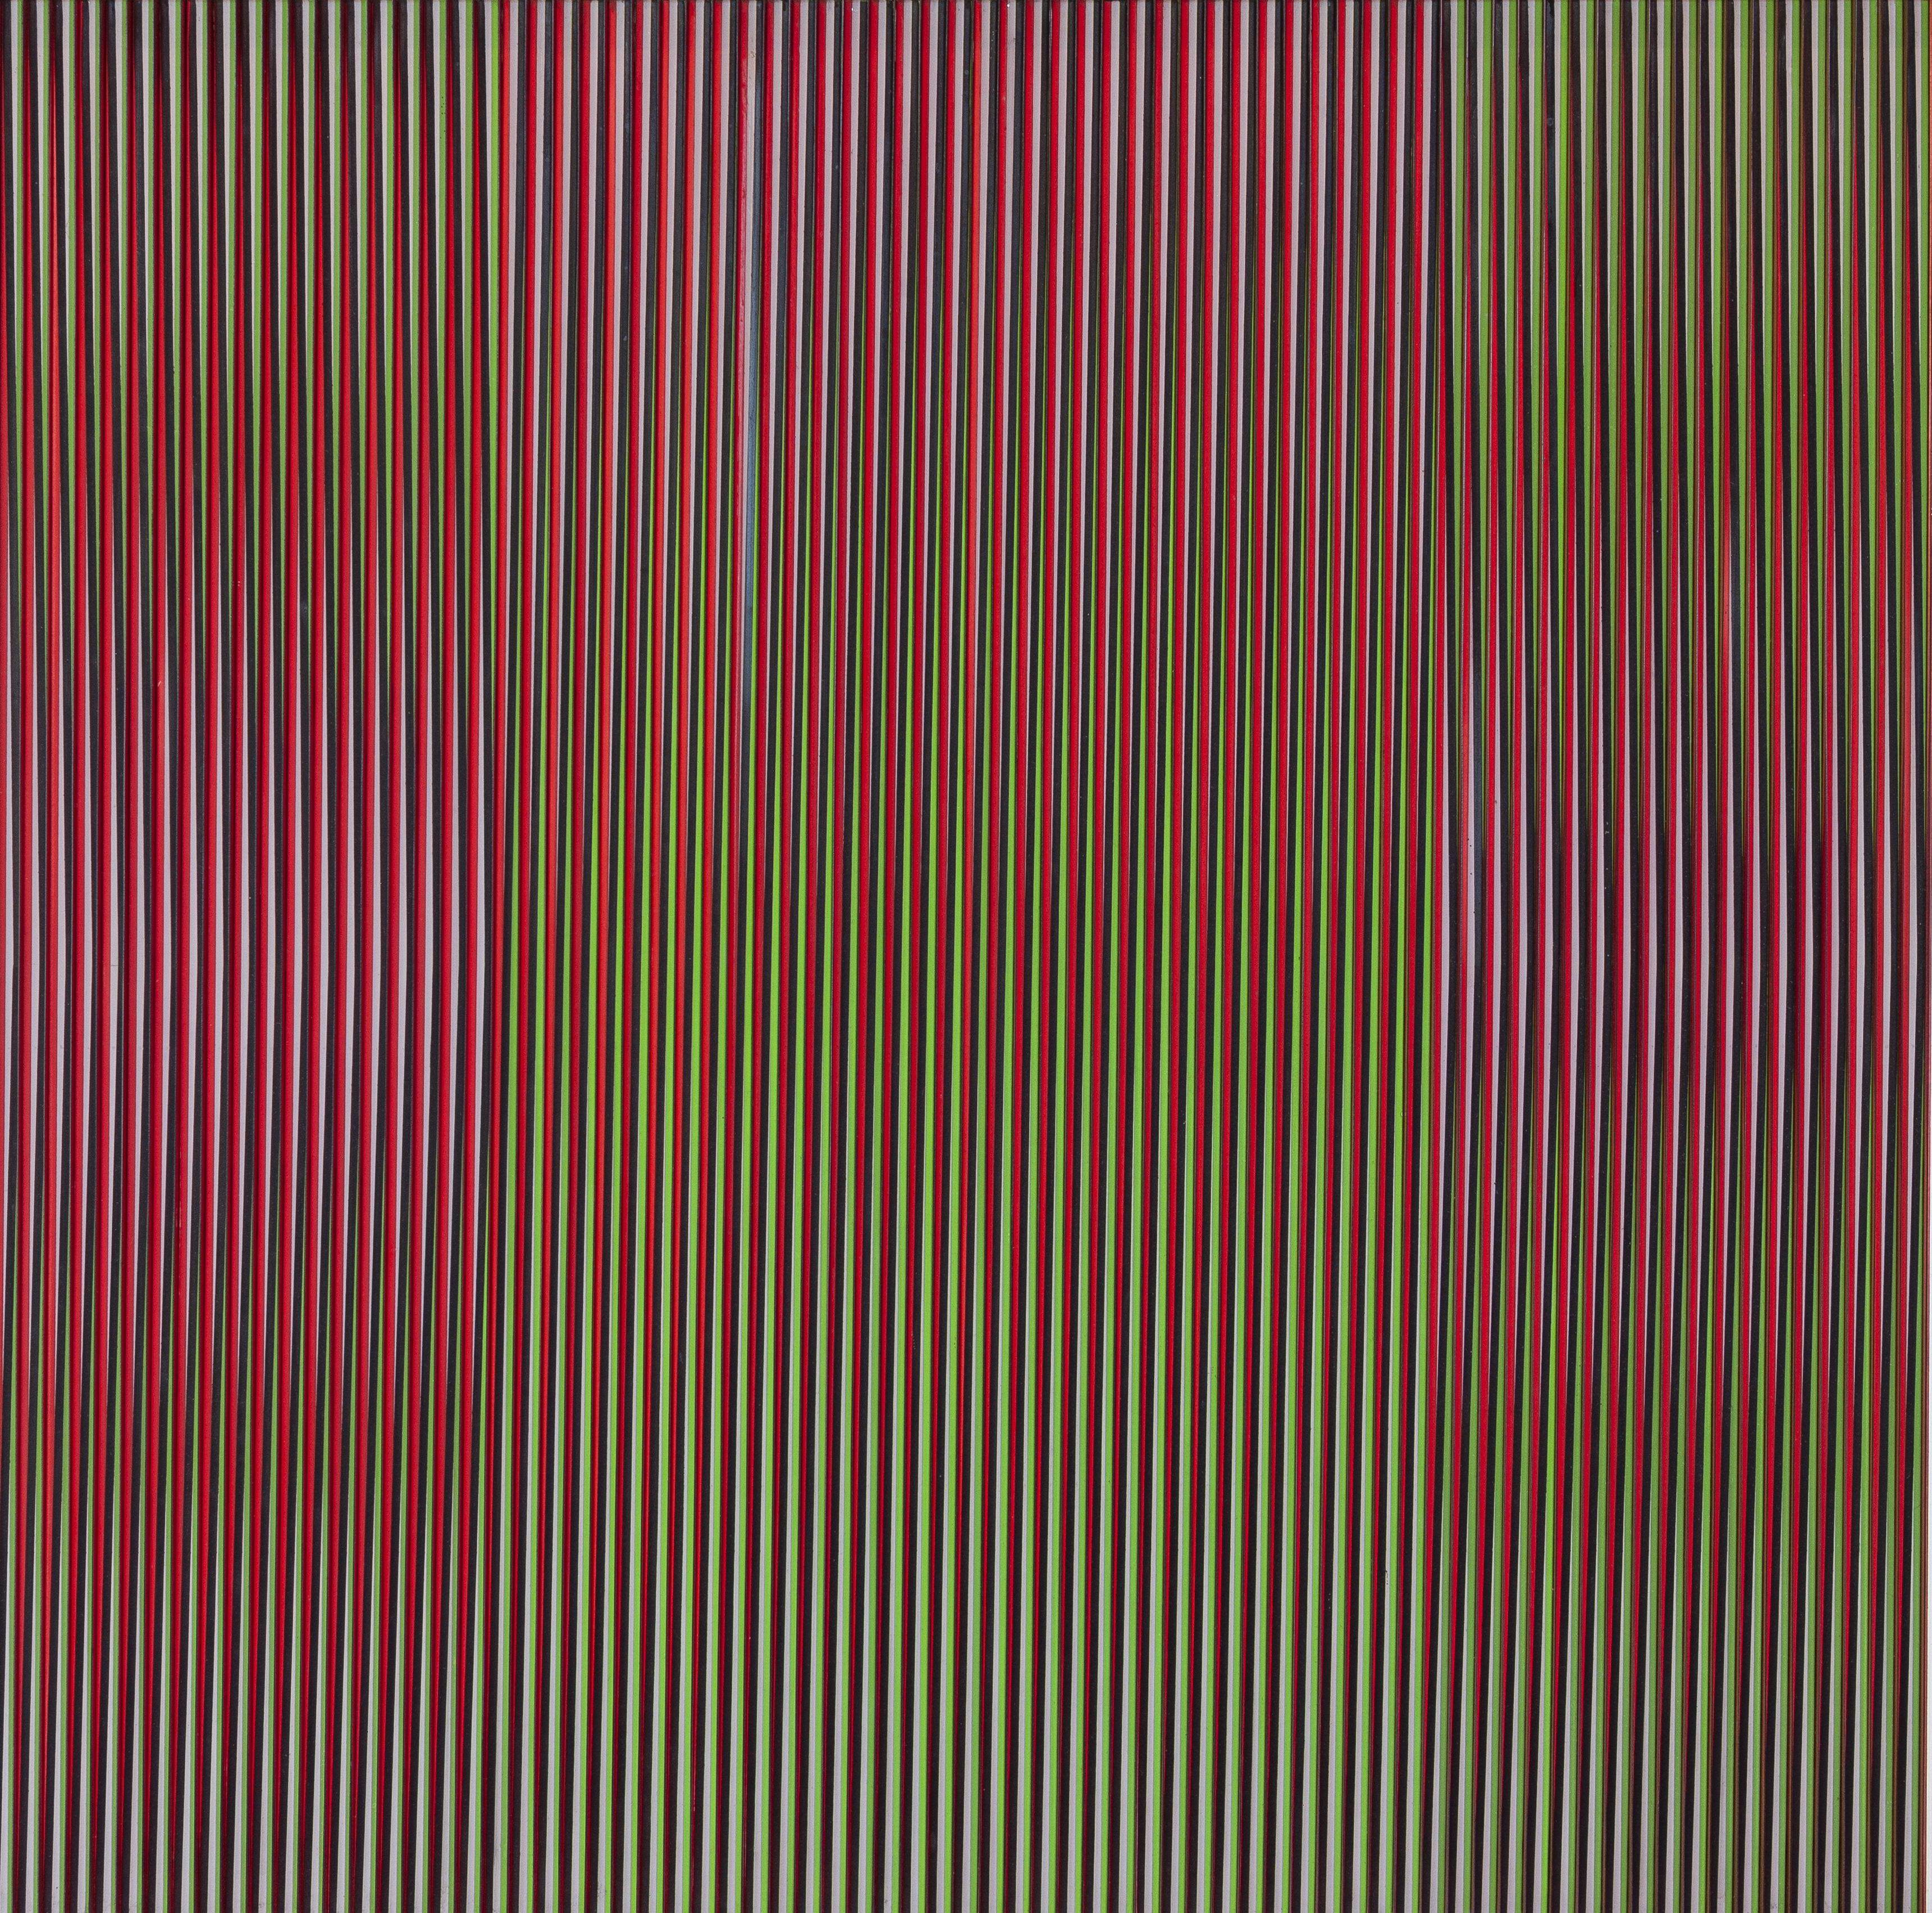 Carlos Cruz-Diez, Physichromie 887, 1976. Aluminum and Plexiglass, 31 1/2 x 31 1/2 in.